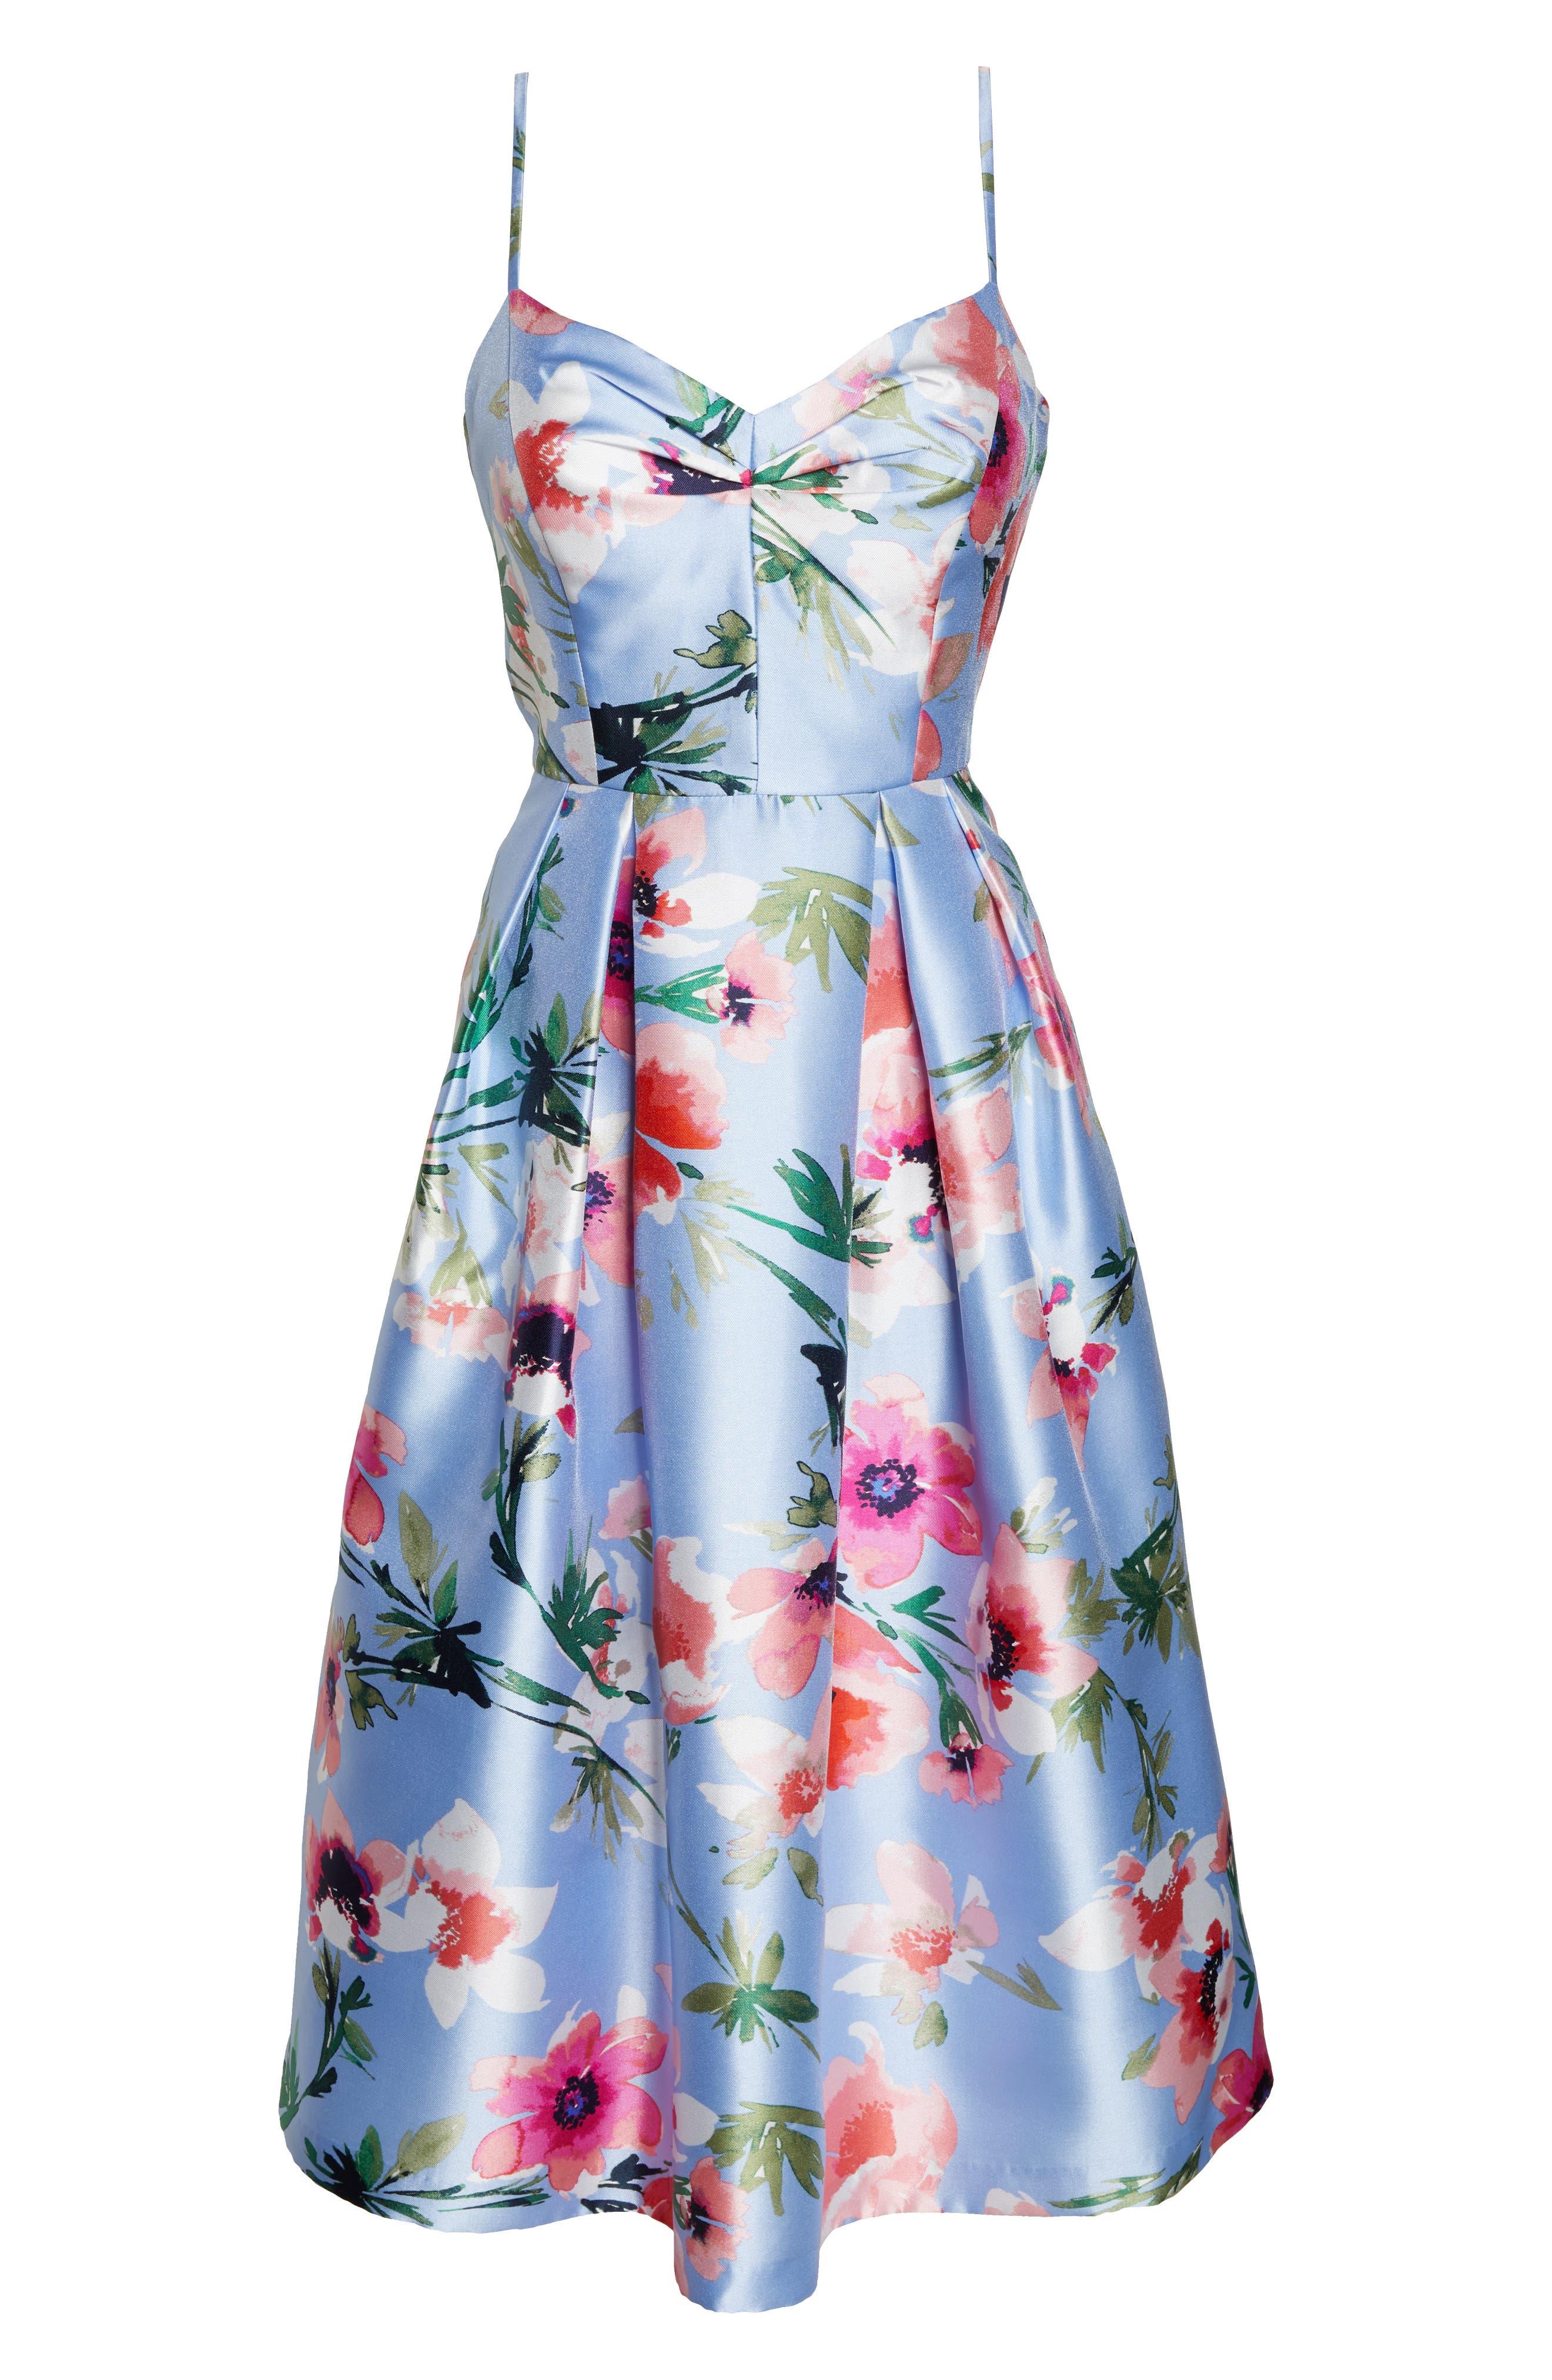 ELIZA J, Floral Print Satin Cocktail Dress, Alternate thumbnail 7, color, BLUE